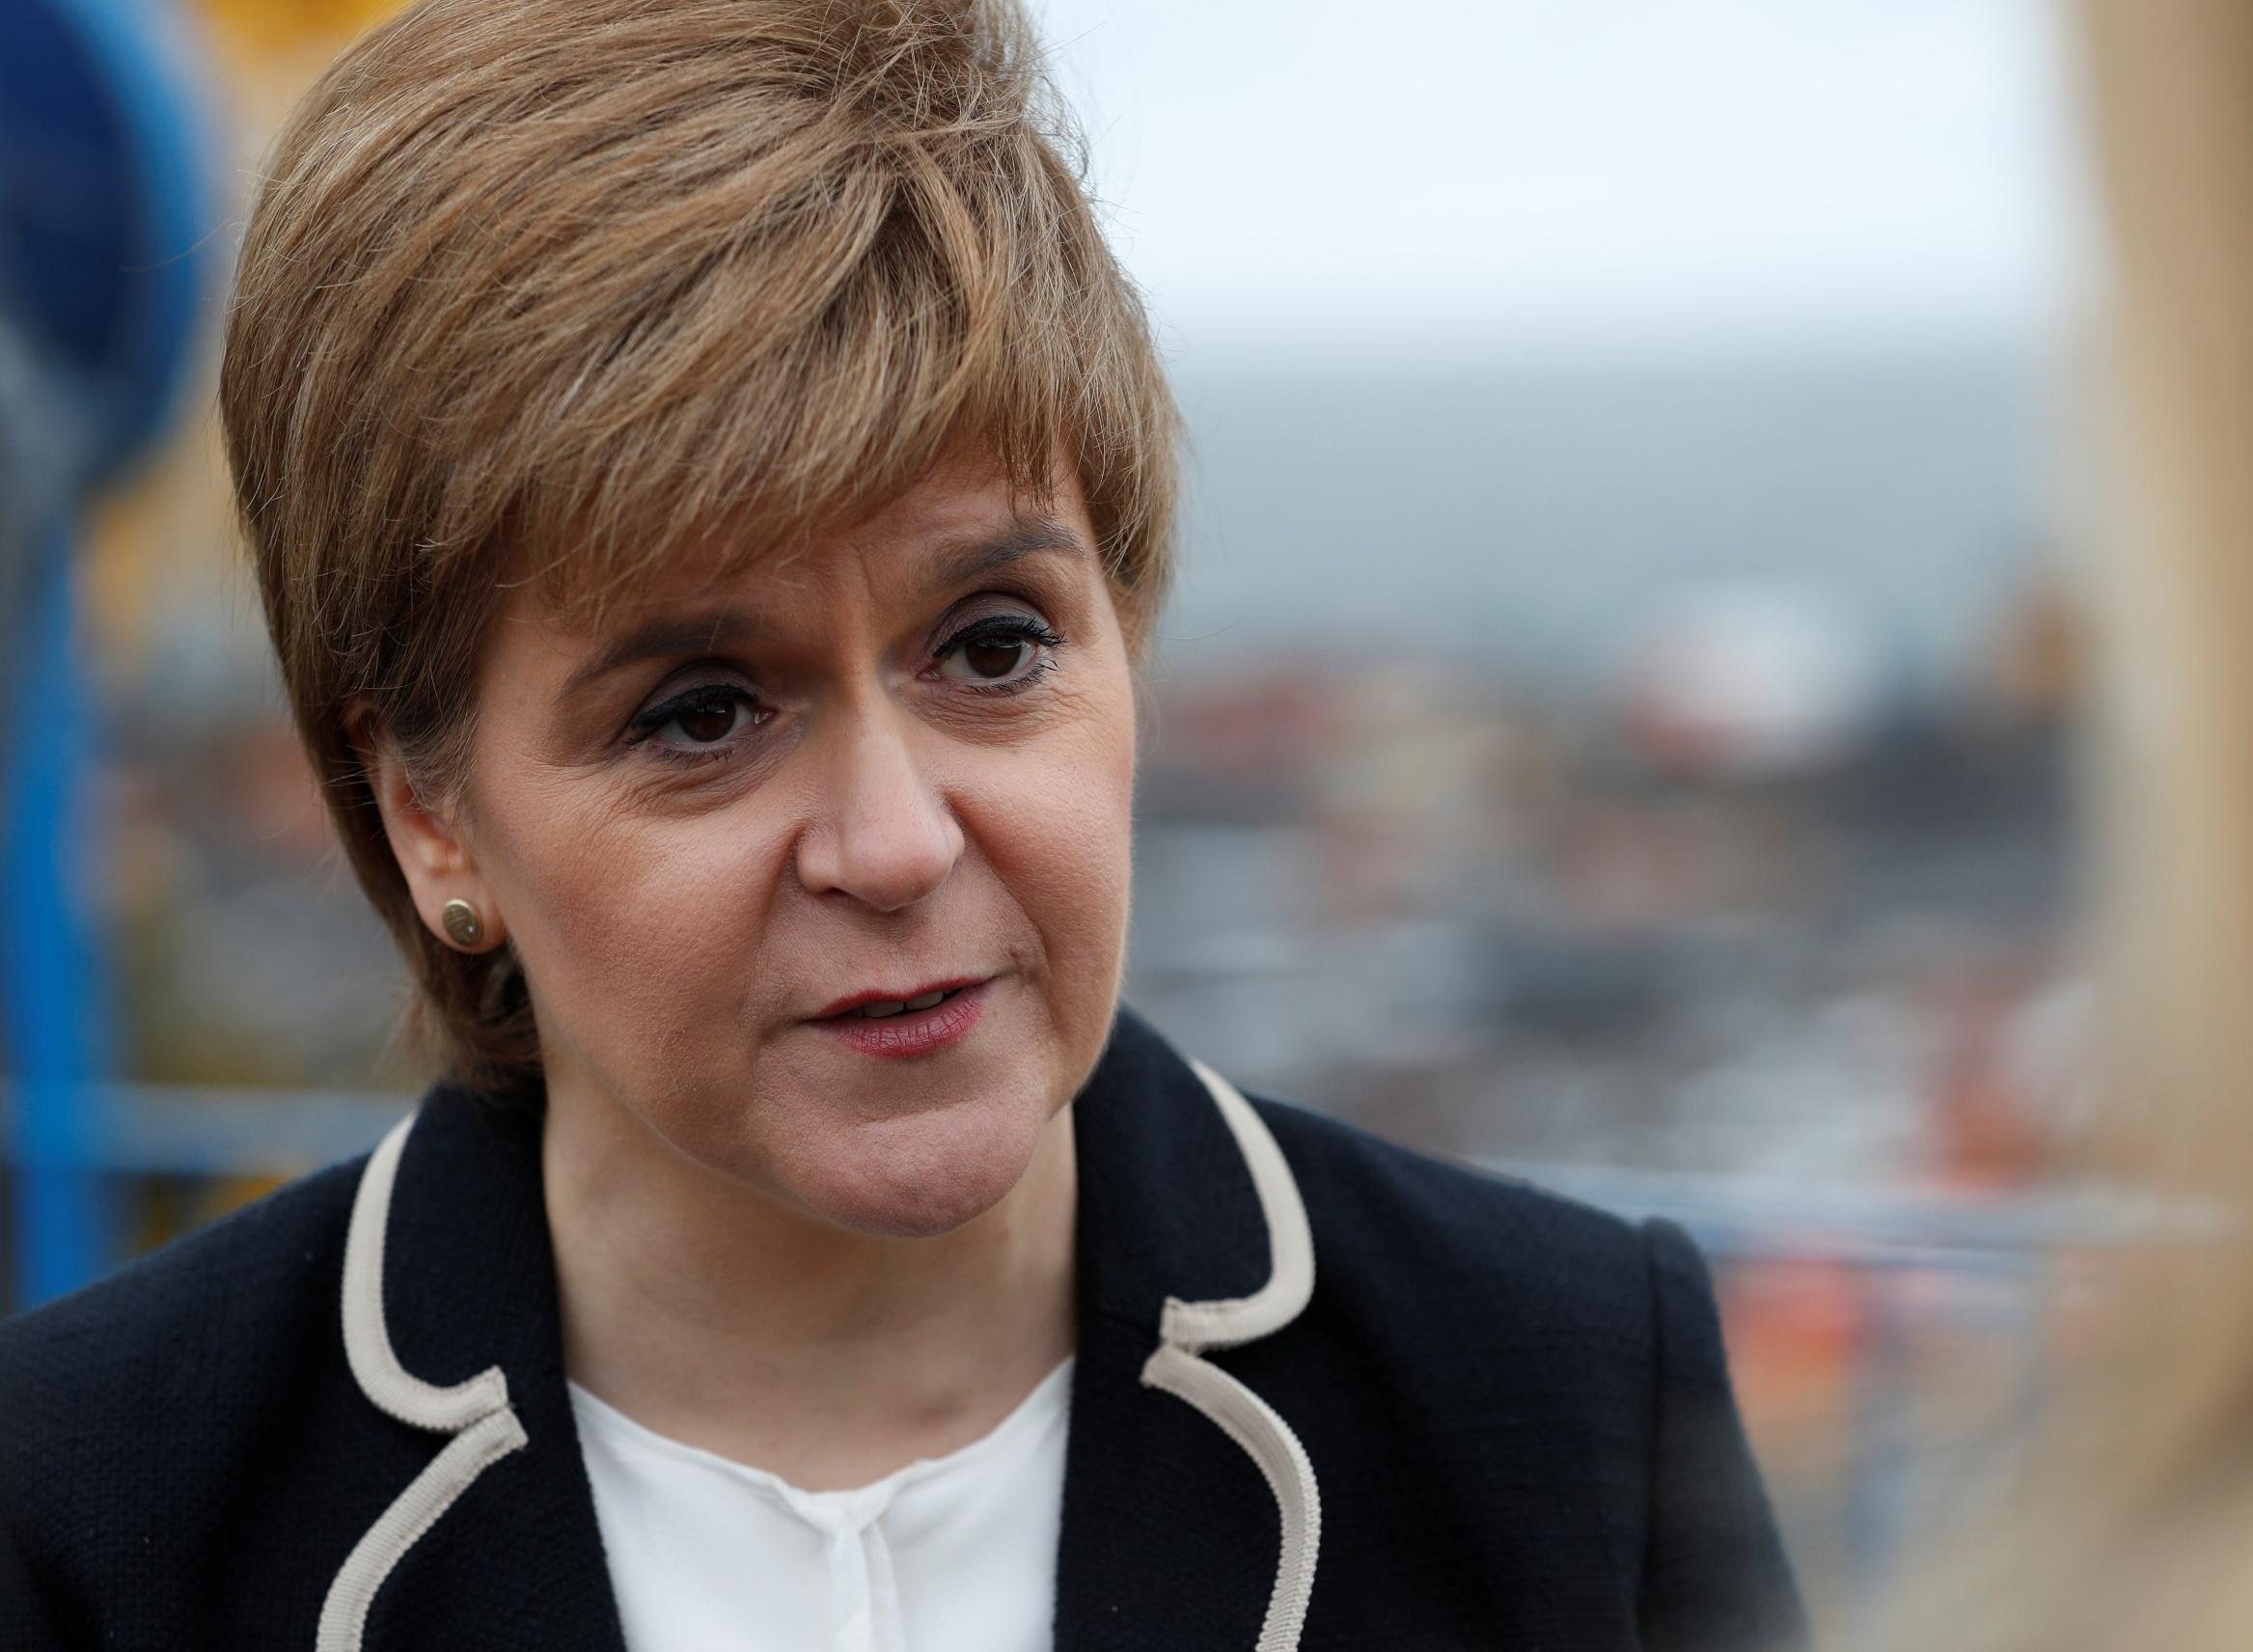 Škotska premijerka Nicola Sturgeon